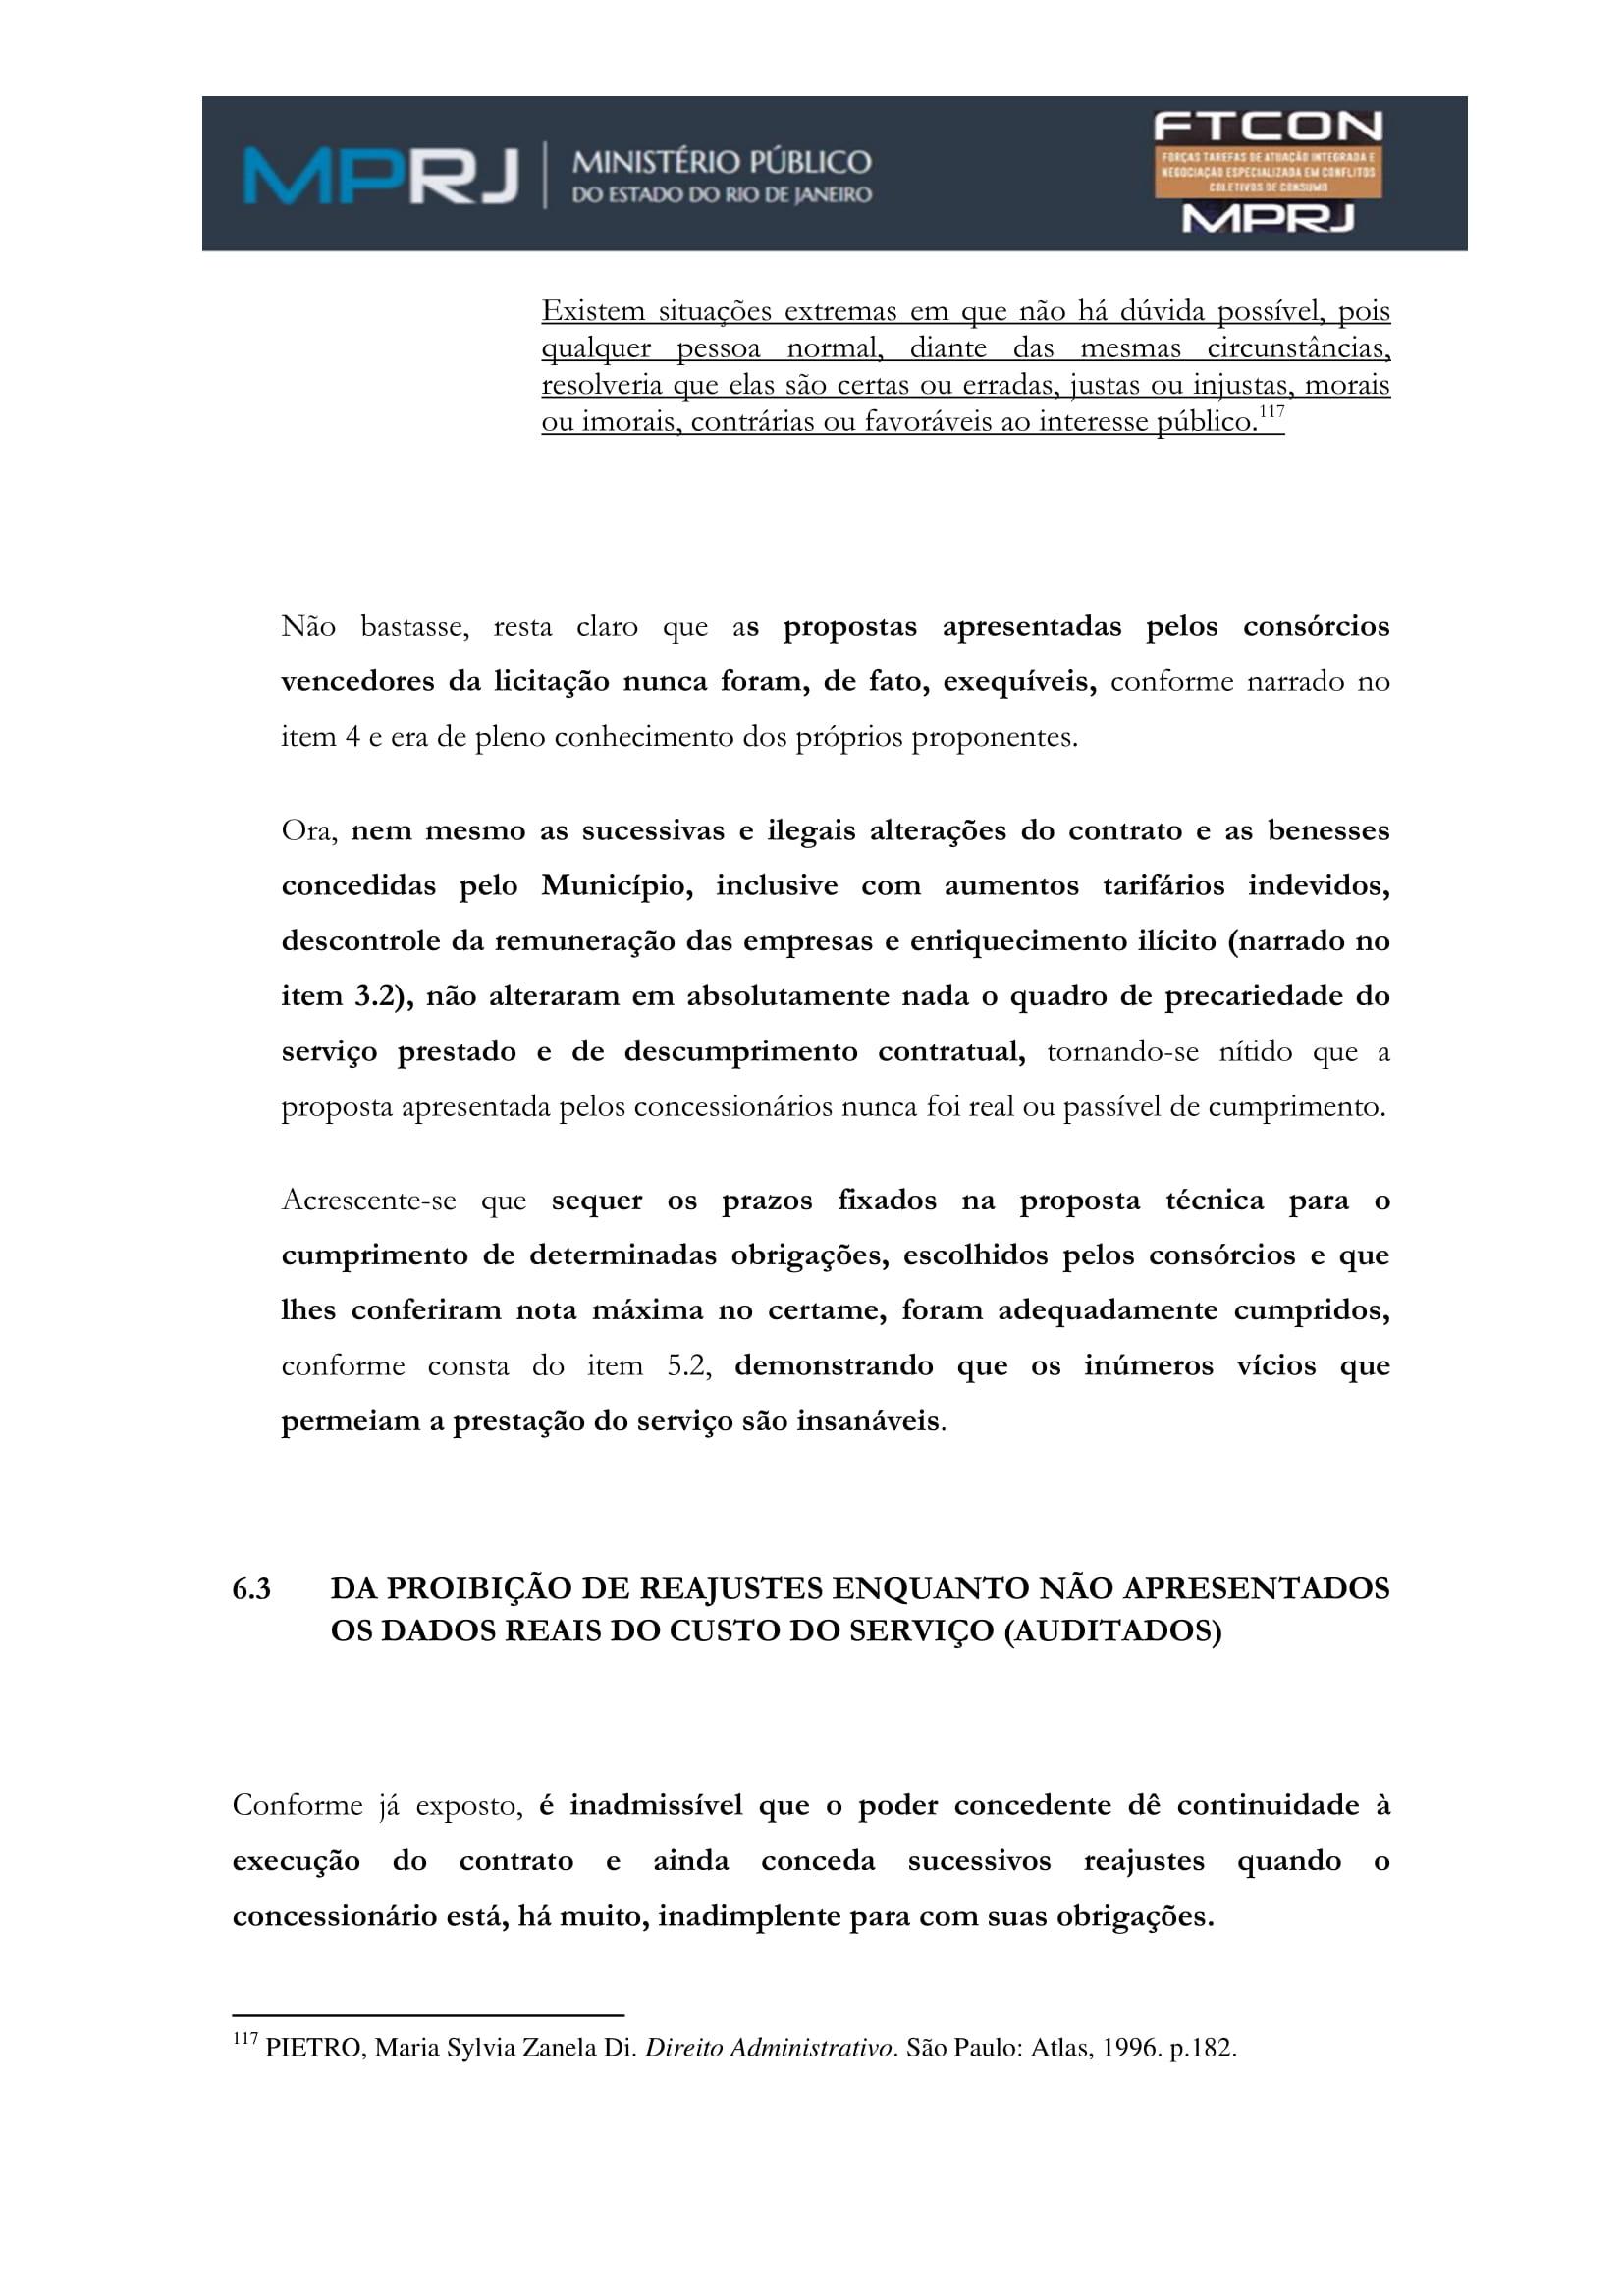 acp_caducidade_onibus_dr_rt-126